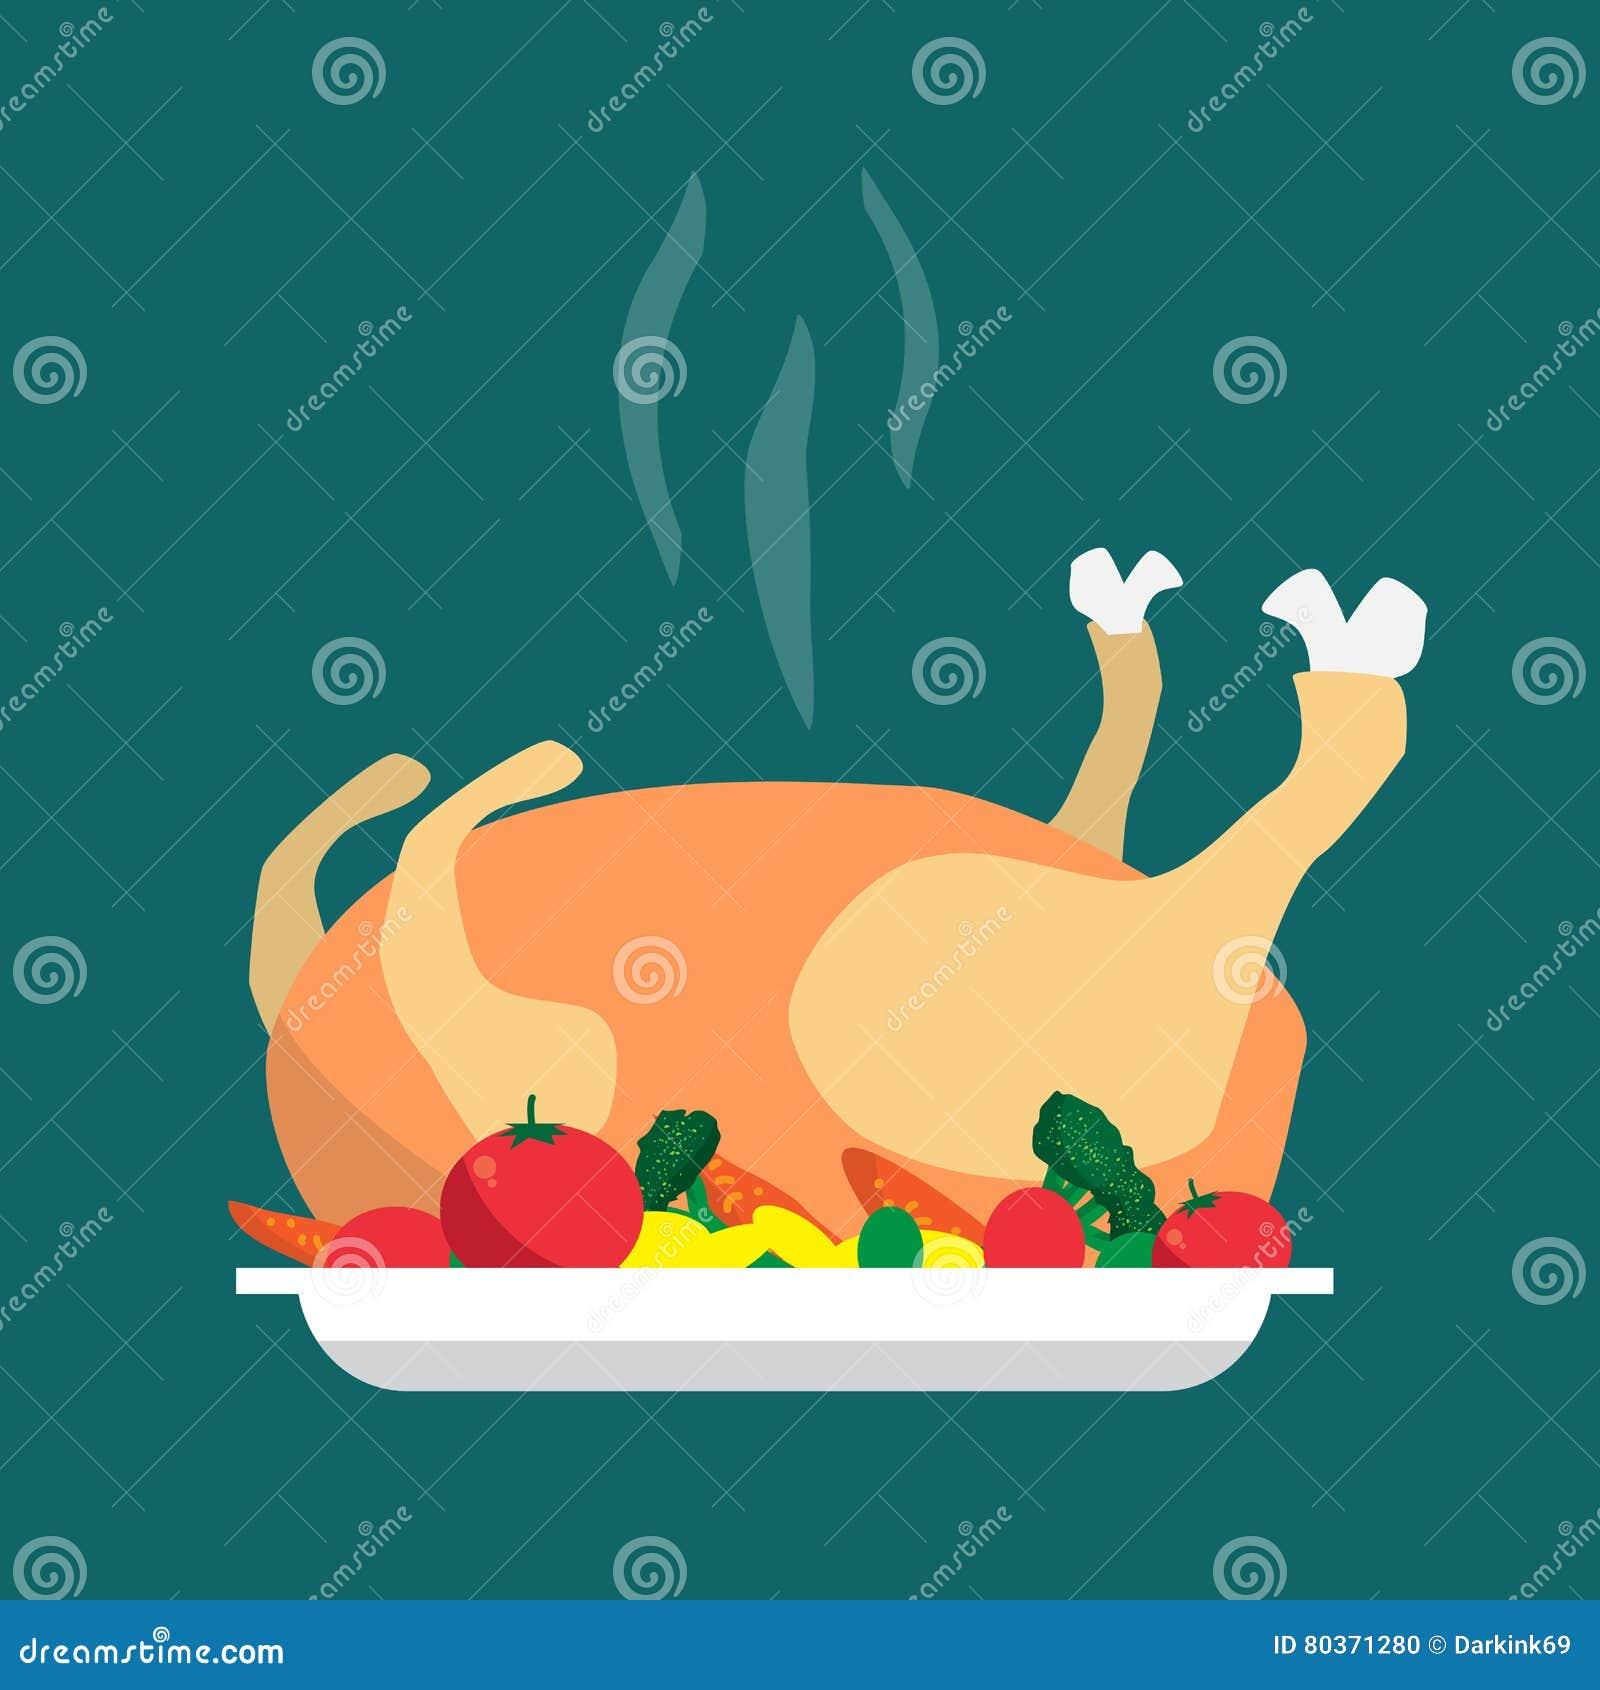 Happy Holidays Cartoon Flat Cooked Roasted Turkey ...